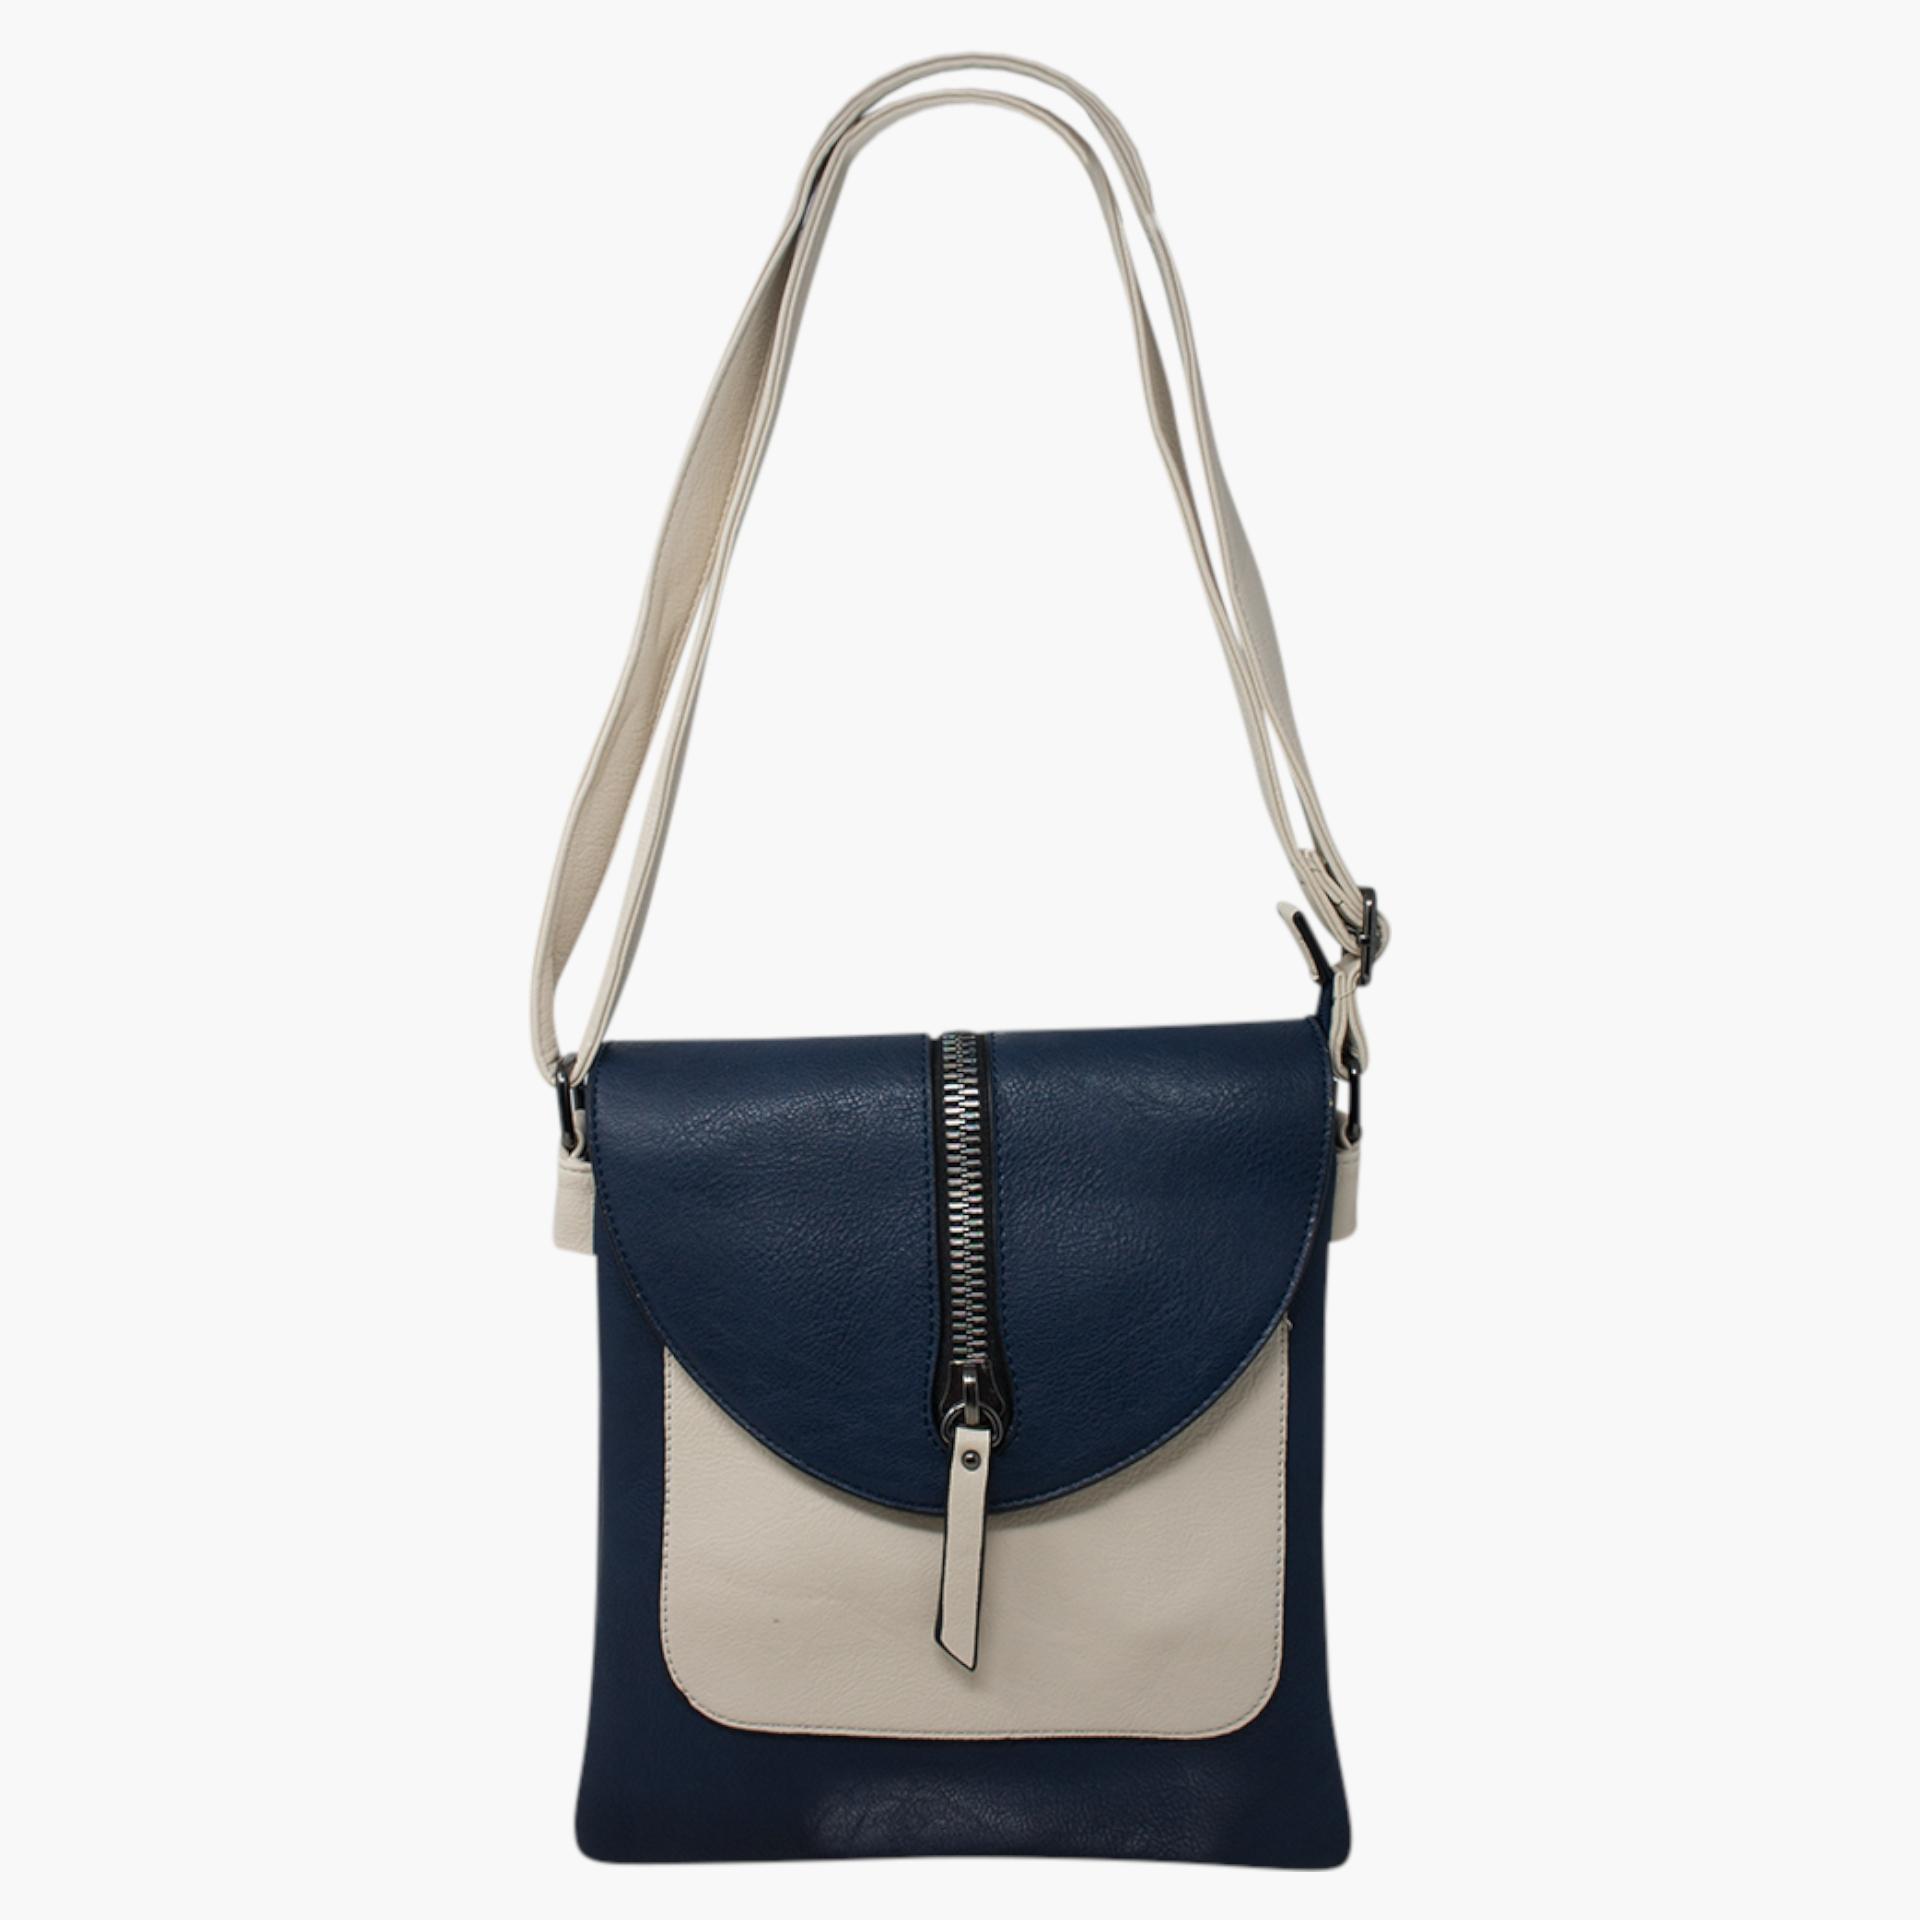 Cross Body Bag with Zip Detail - Navy Blue/Cream